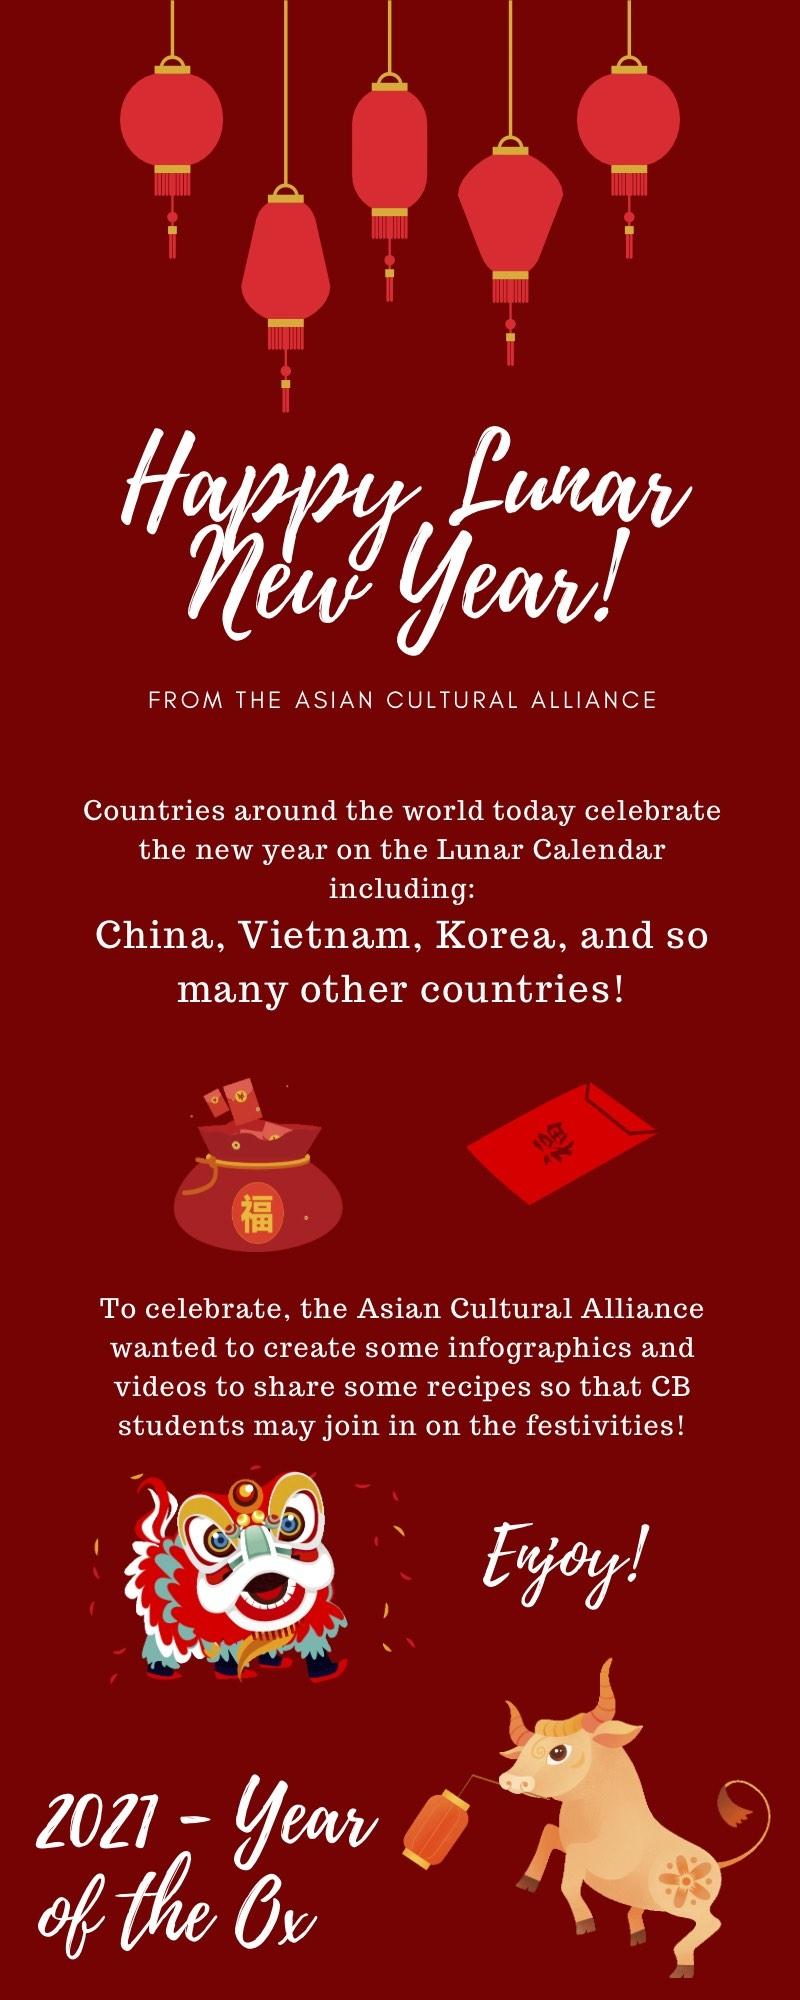 CB Asian Cultural Alliance Celebrates Lunar New Year